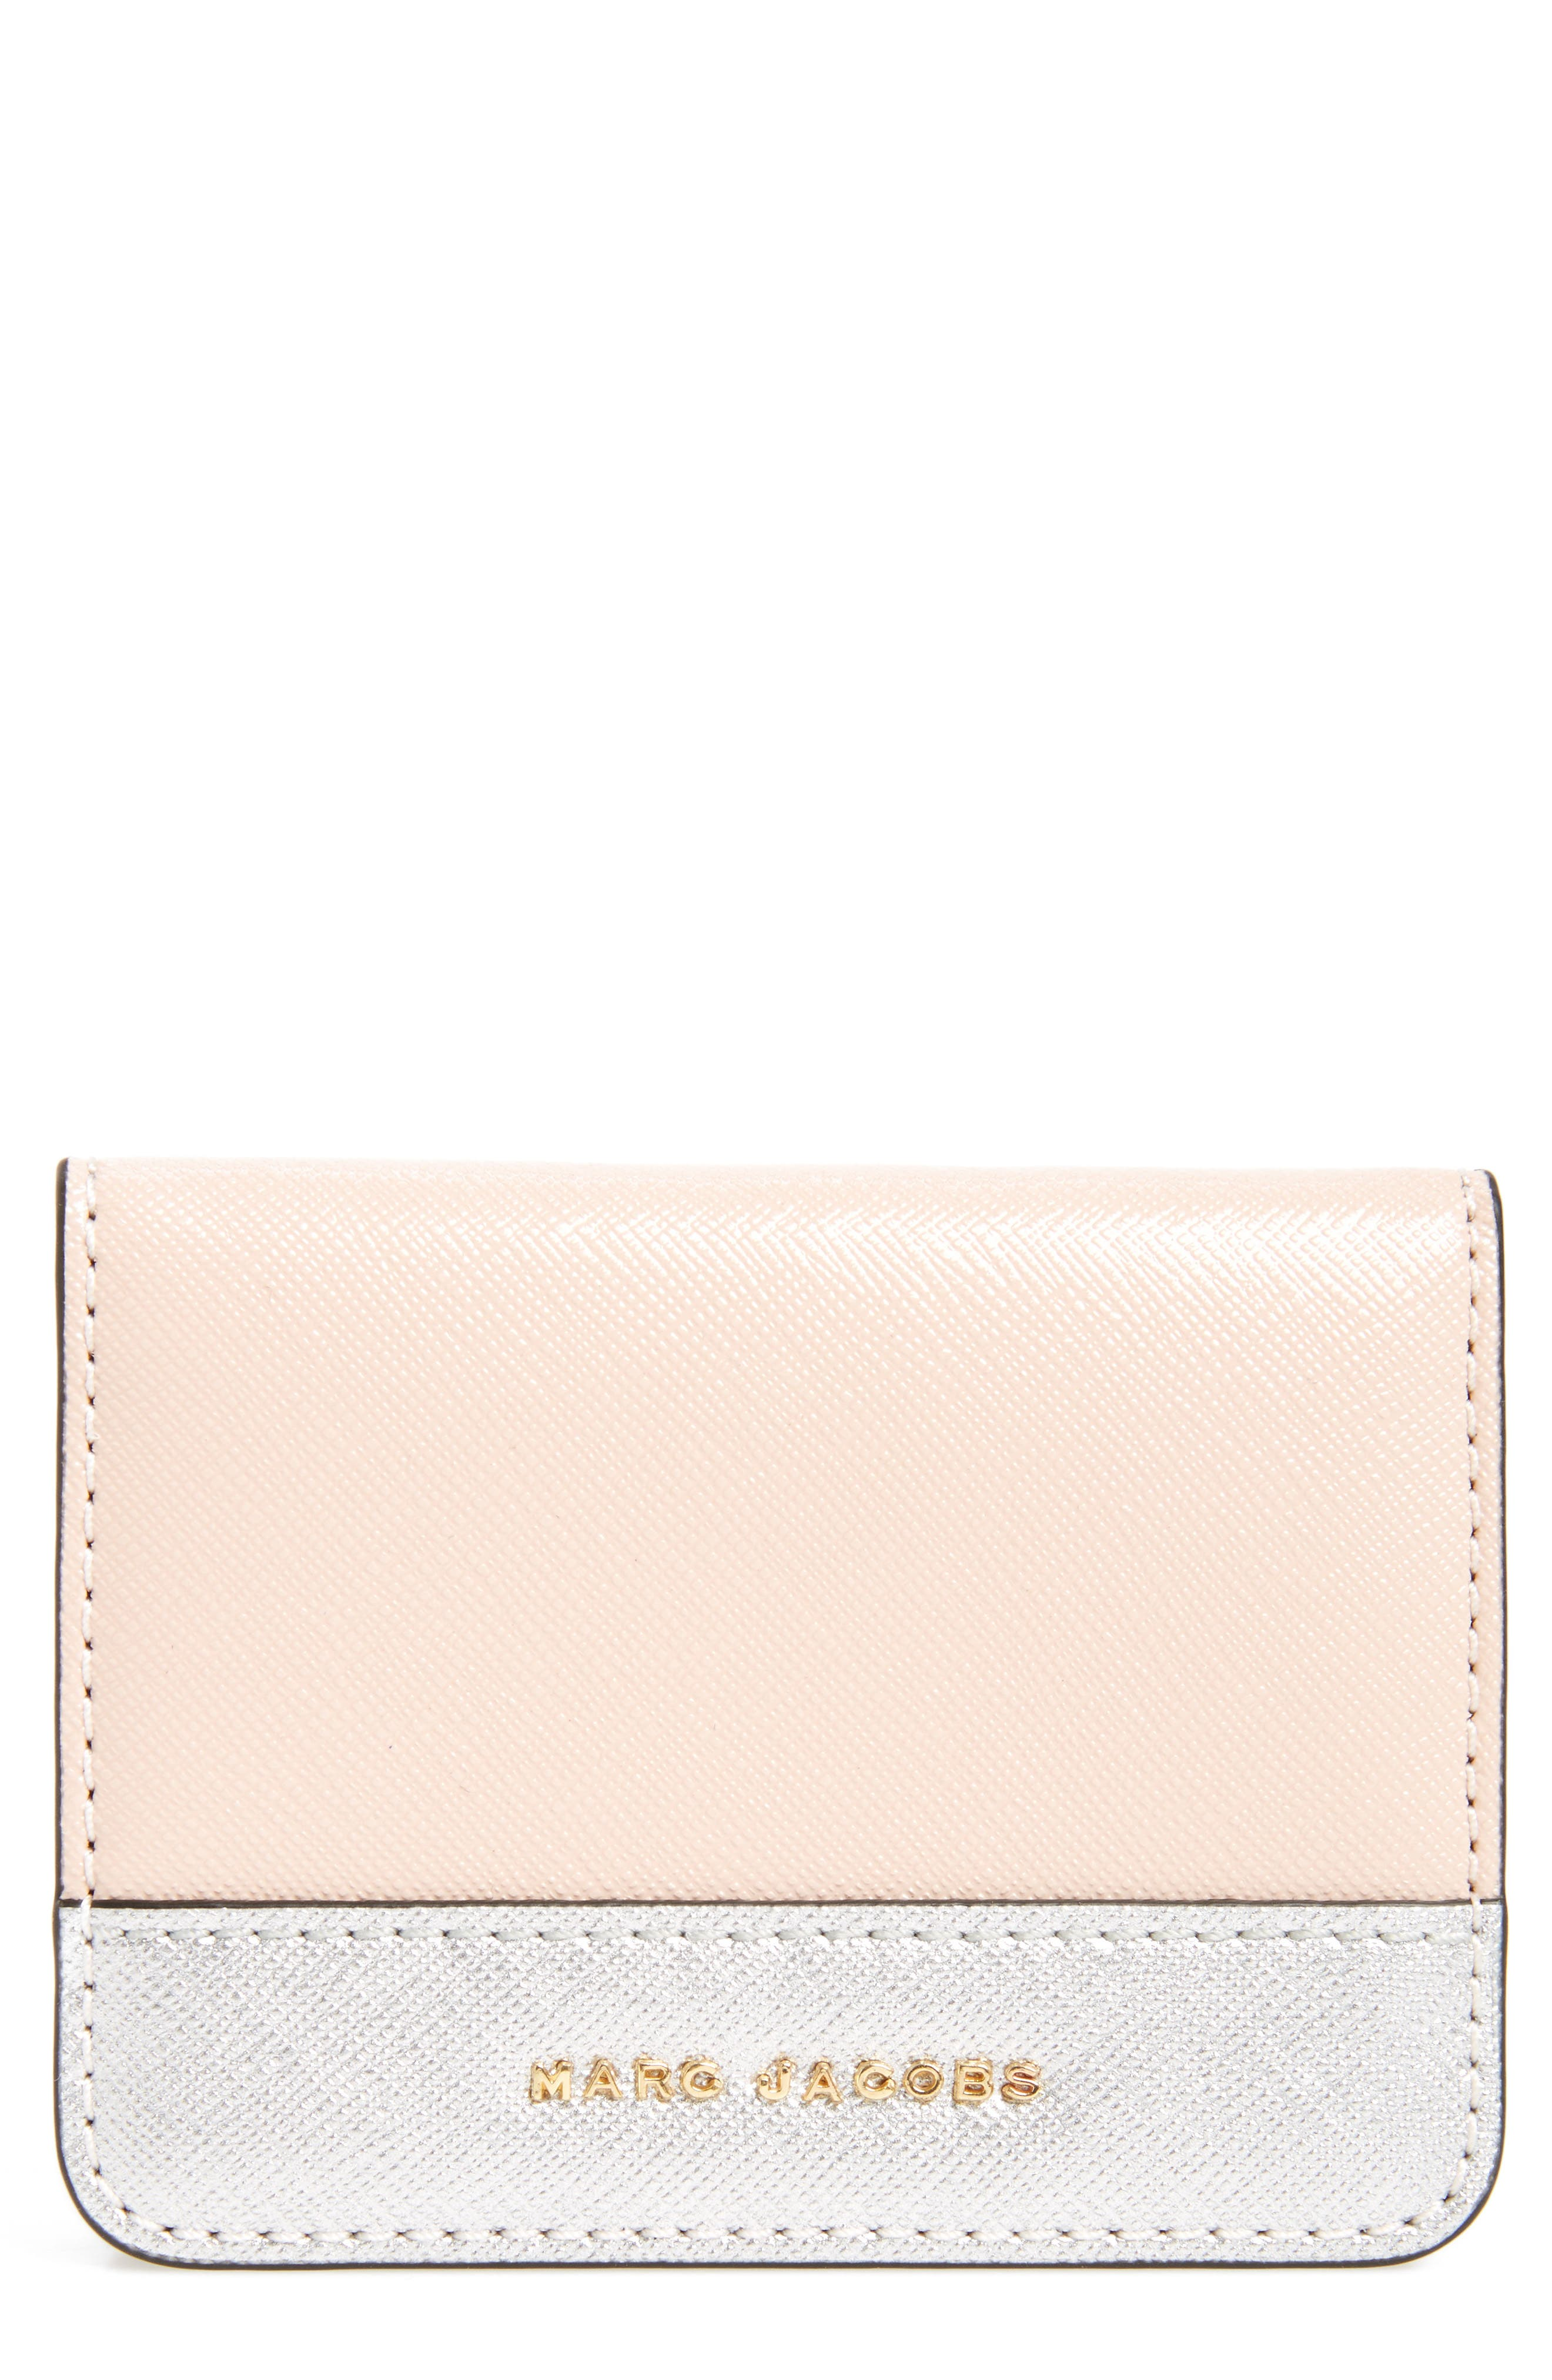 Color Block Saffiano Leather Business Card Case,                         Main,                         color, Pale Pink Multi